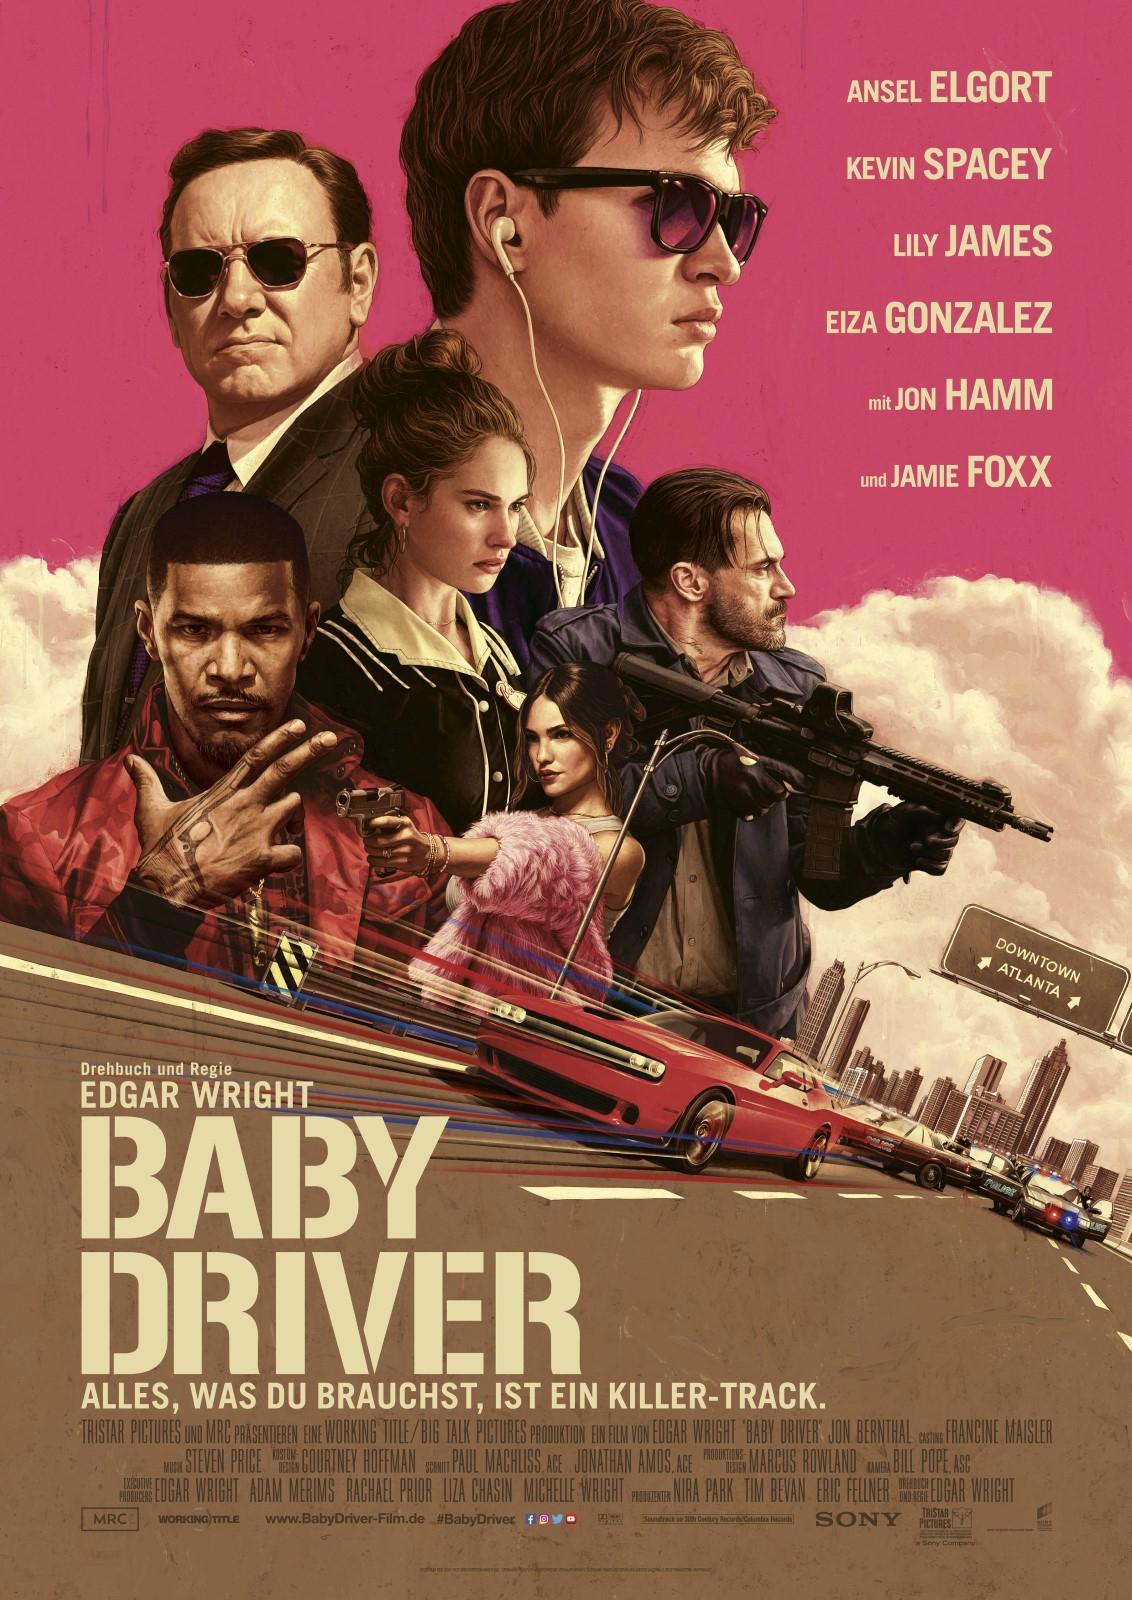 [iTunes] Baby Driver für 3,99€ in 4K HDR / Dolby Vision und Dolby Atmos